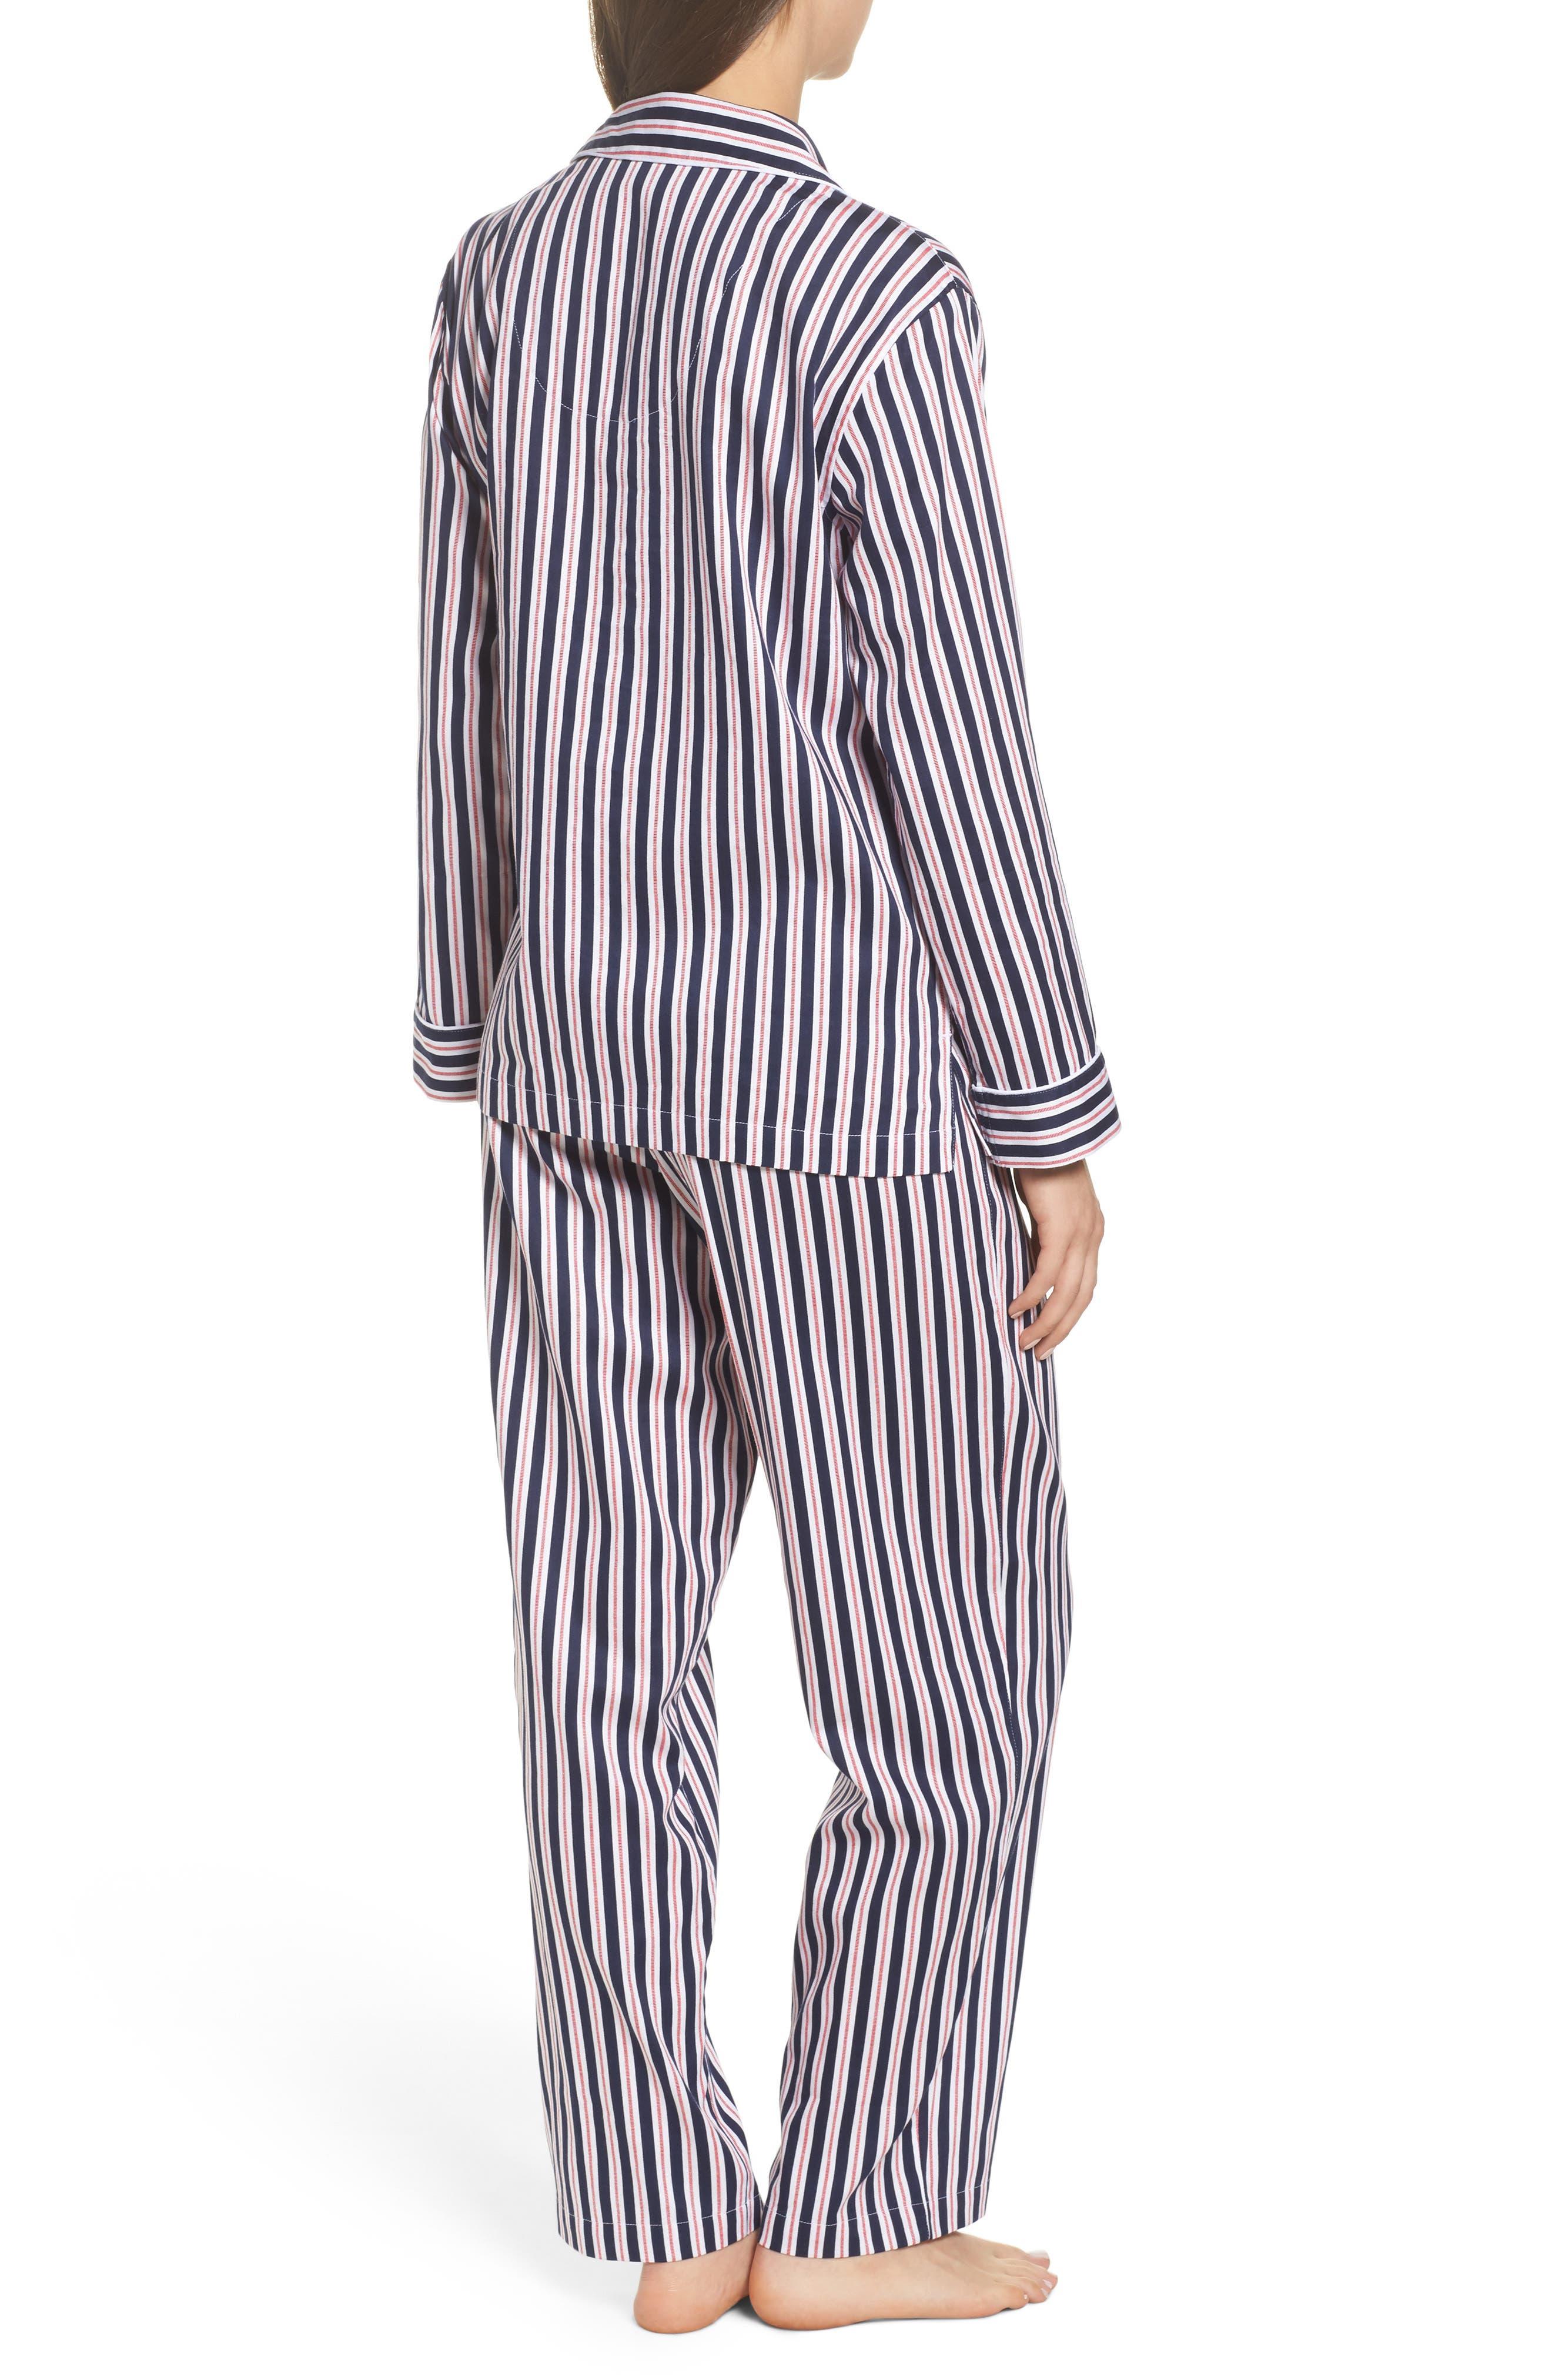 Sateen Pajamas,                             Alternate thumbnail 2, color,                             Navy Stripe